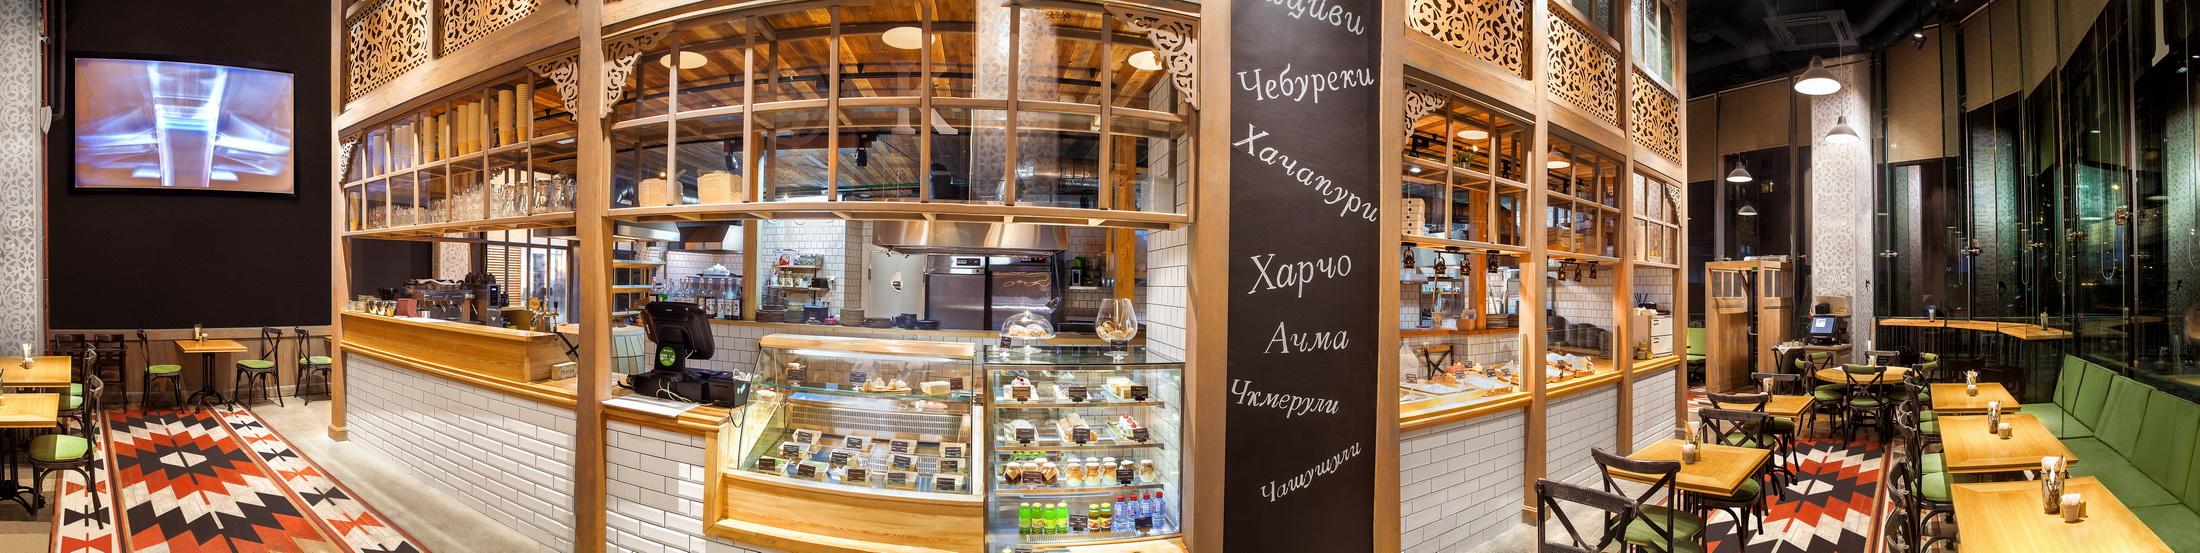 "Москва. Кафе ""Kulinari"""